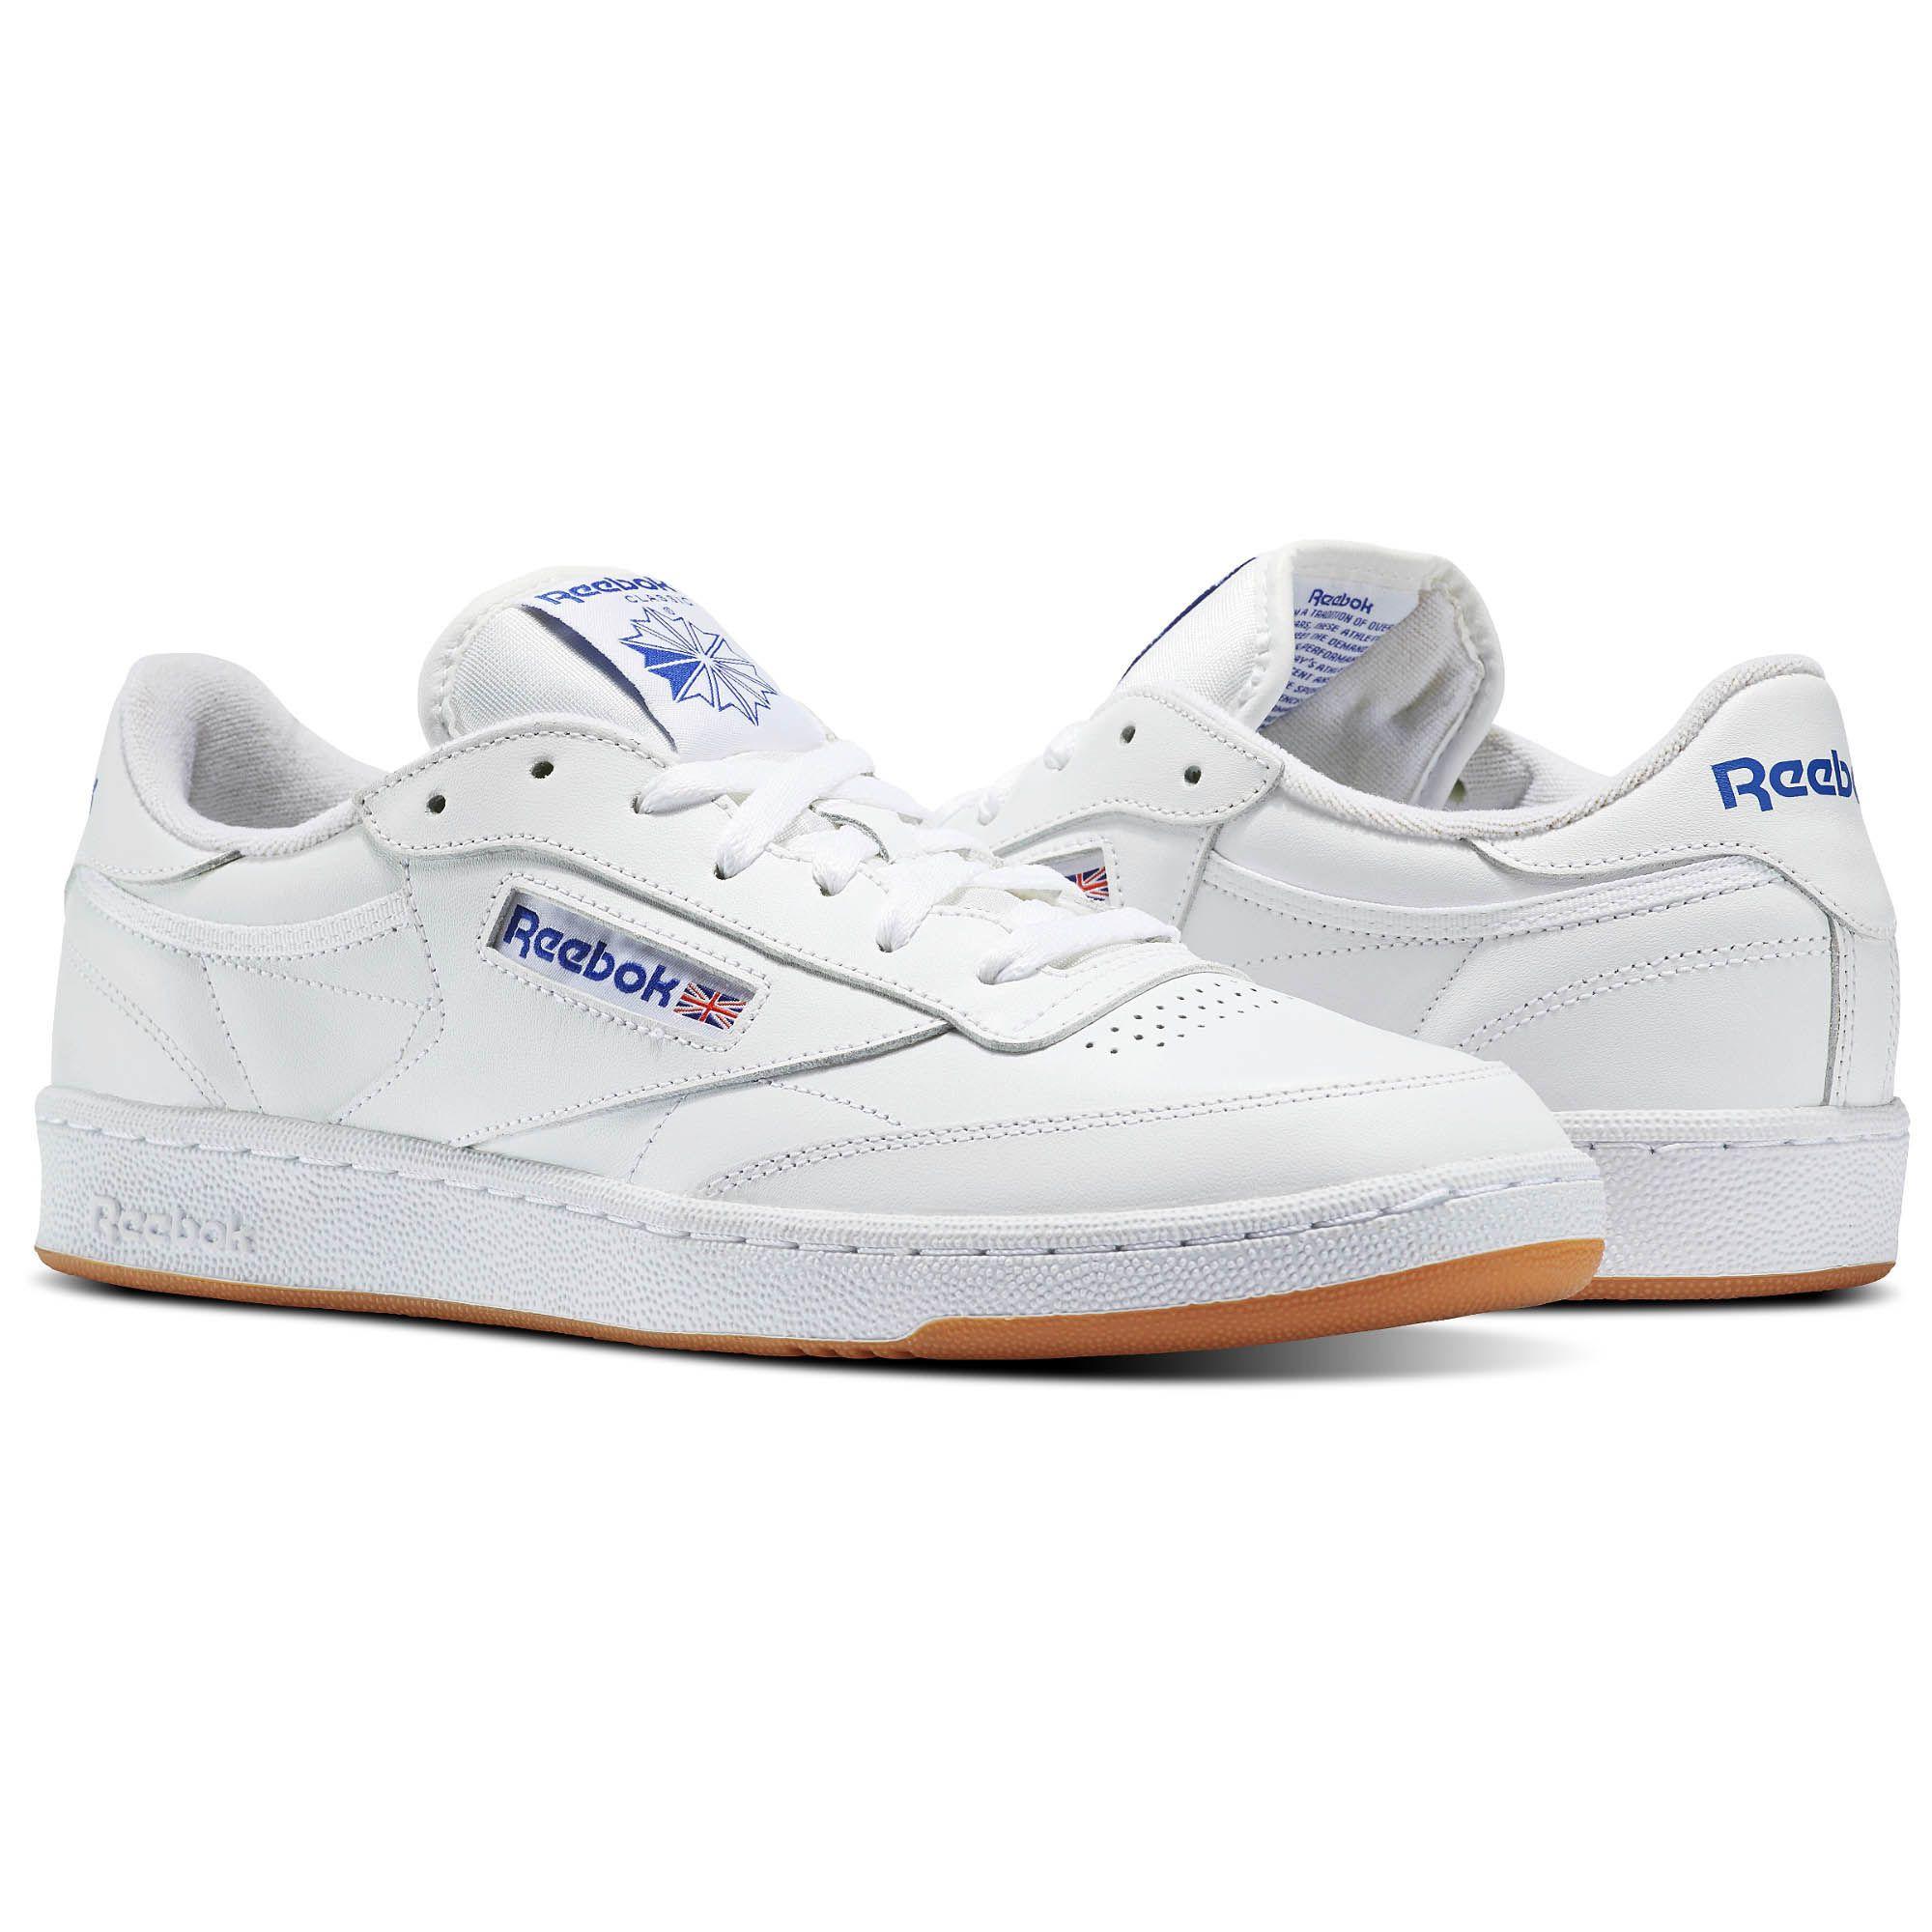 CLUB C 85 TG - CHAUSSURES - Sneakers & Tennis bassesReebok 8z8ASD3